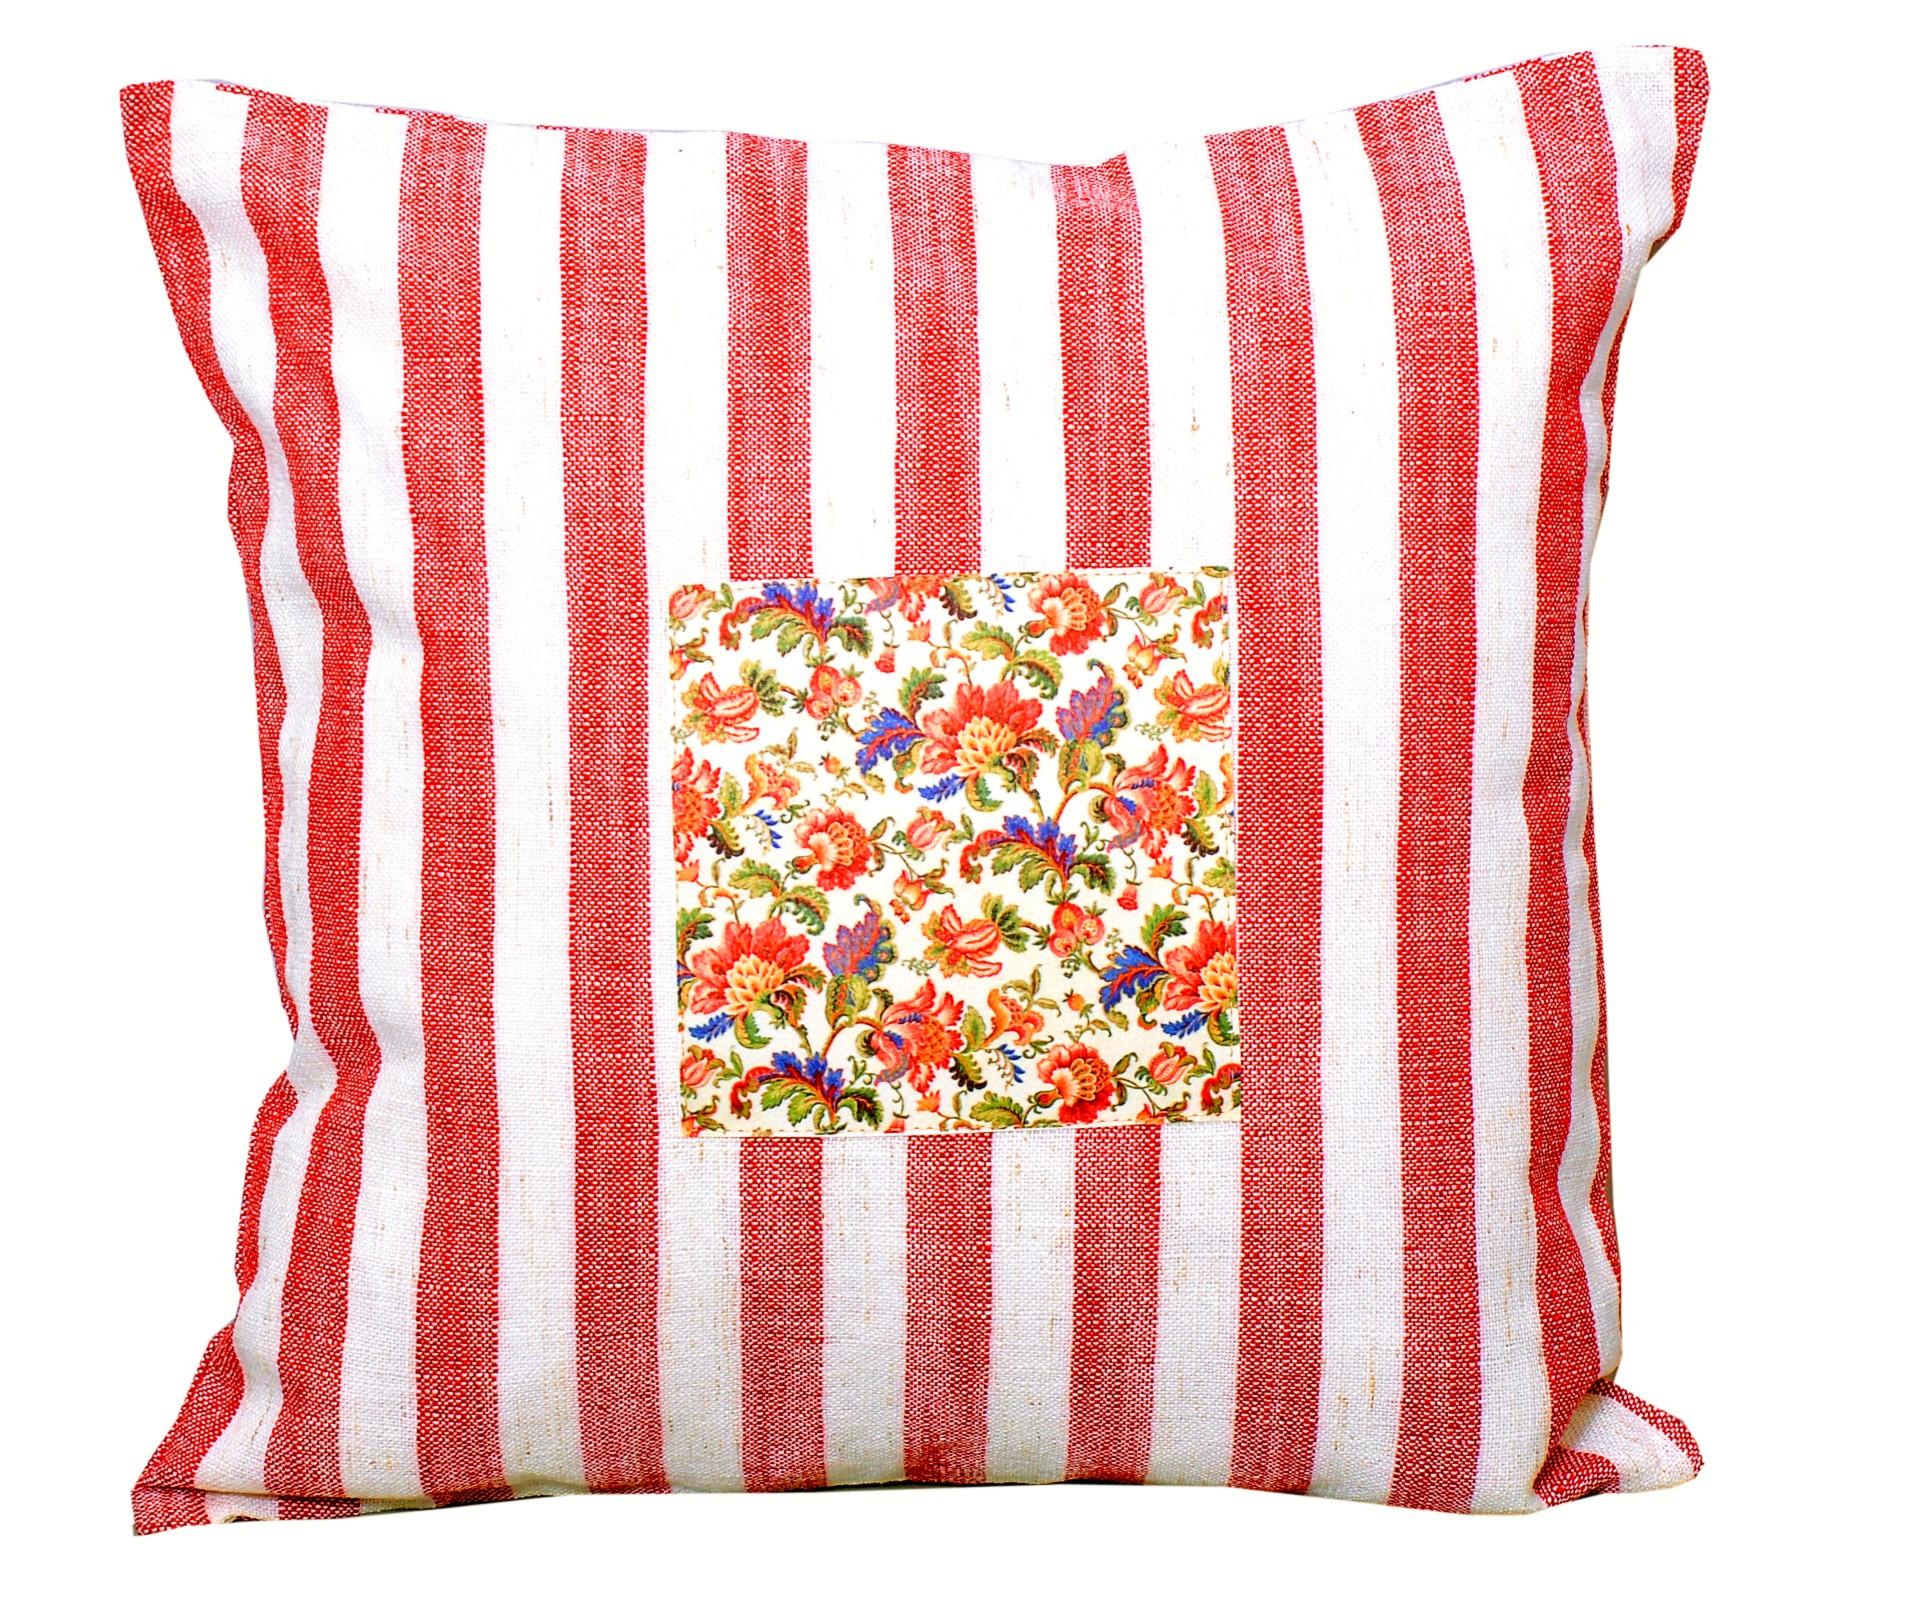 Strip Cushion Cover Red